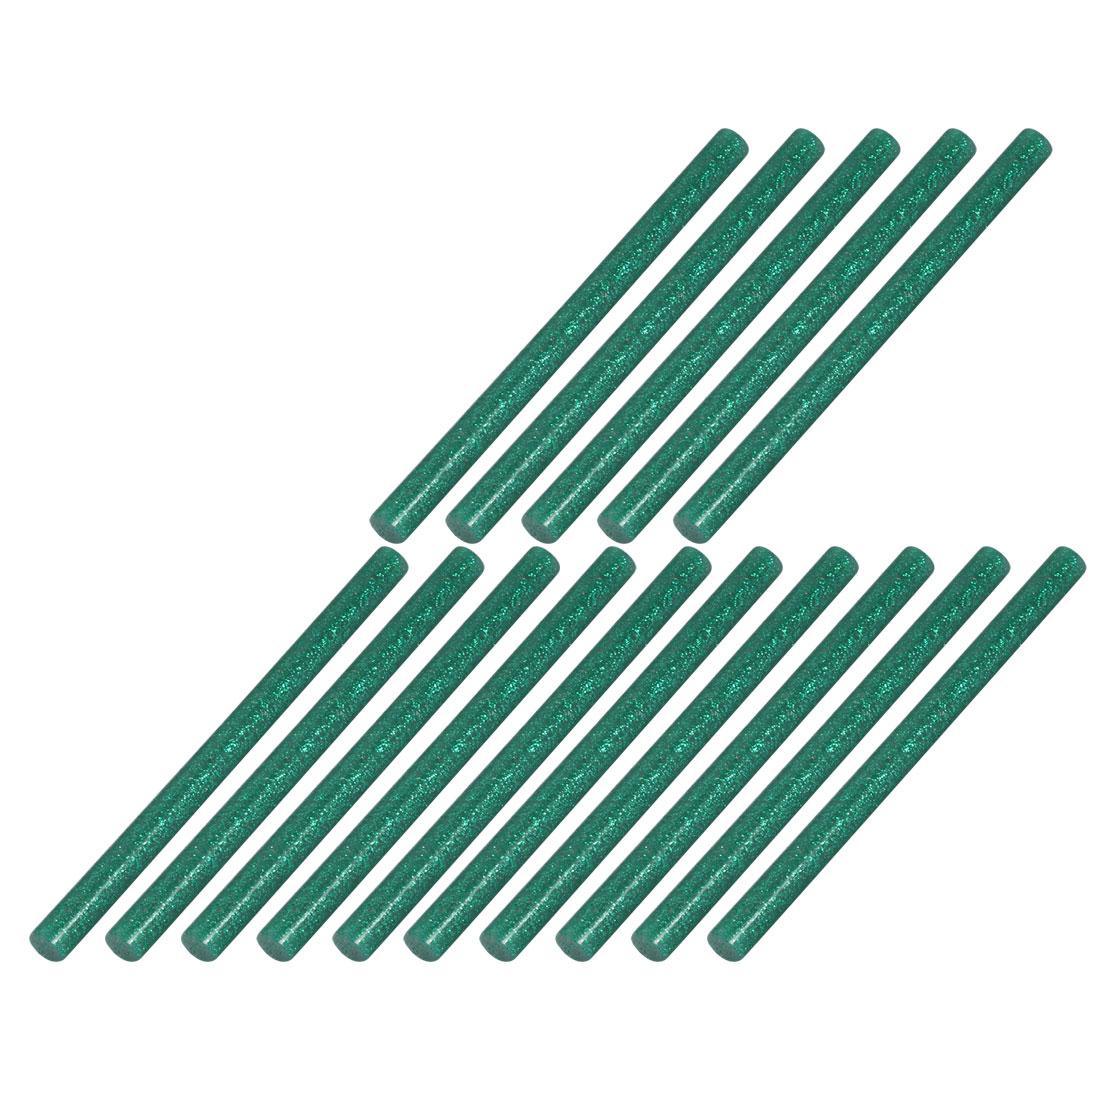 15pcs 7mm Dia 100mm Long Hot Melt Glue Adhesive Stick Blackish Green